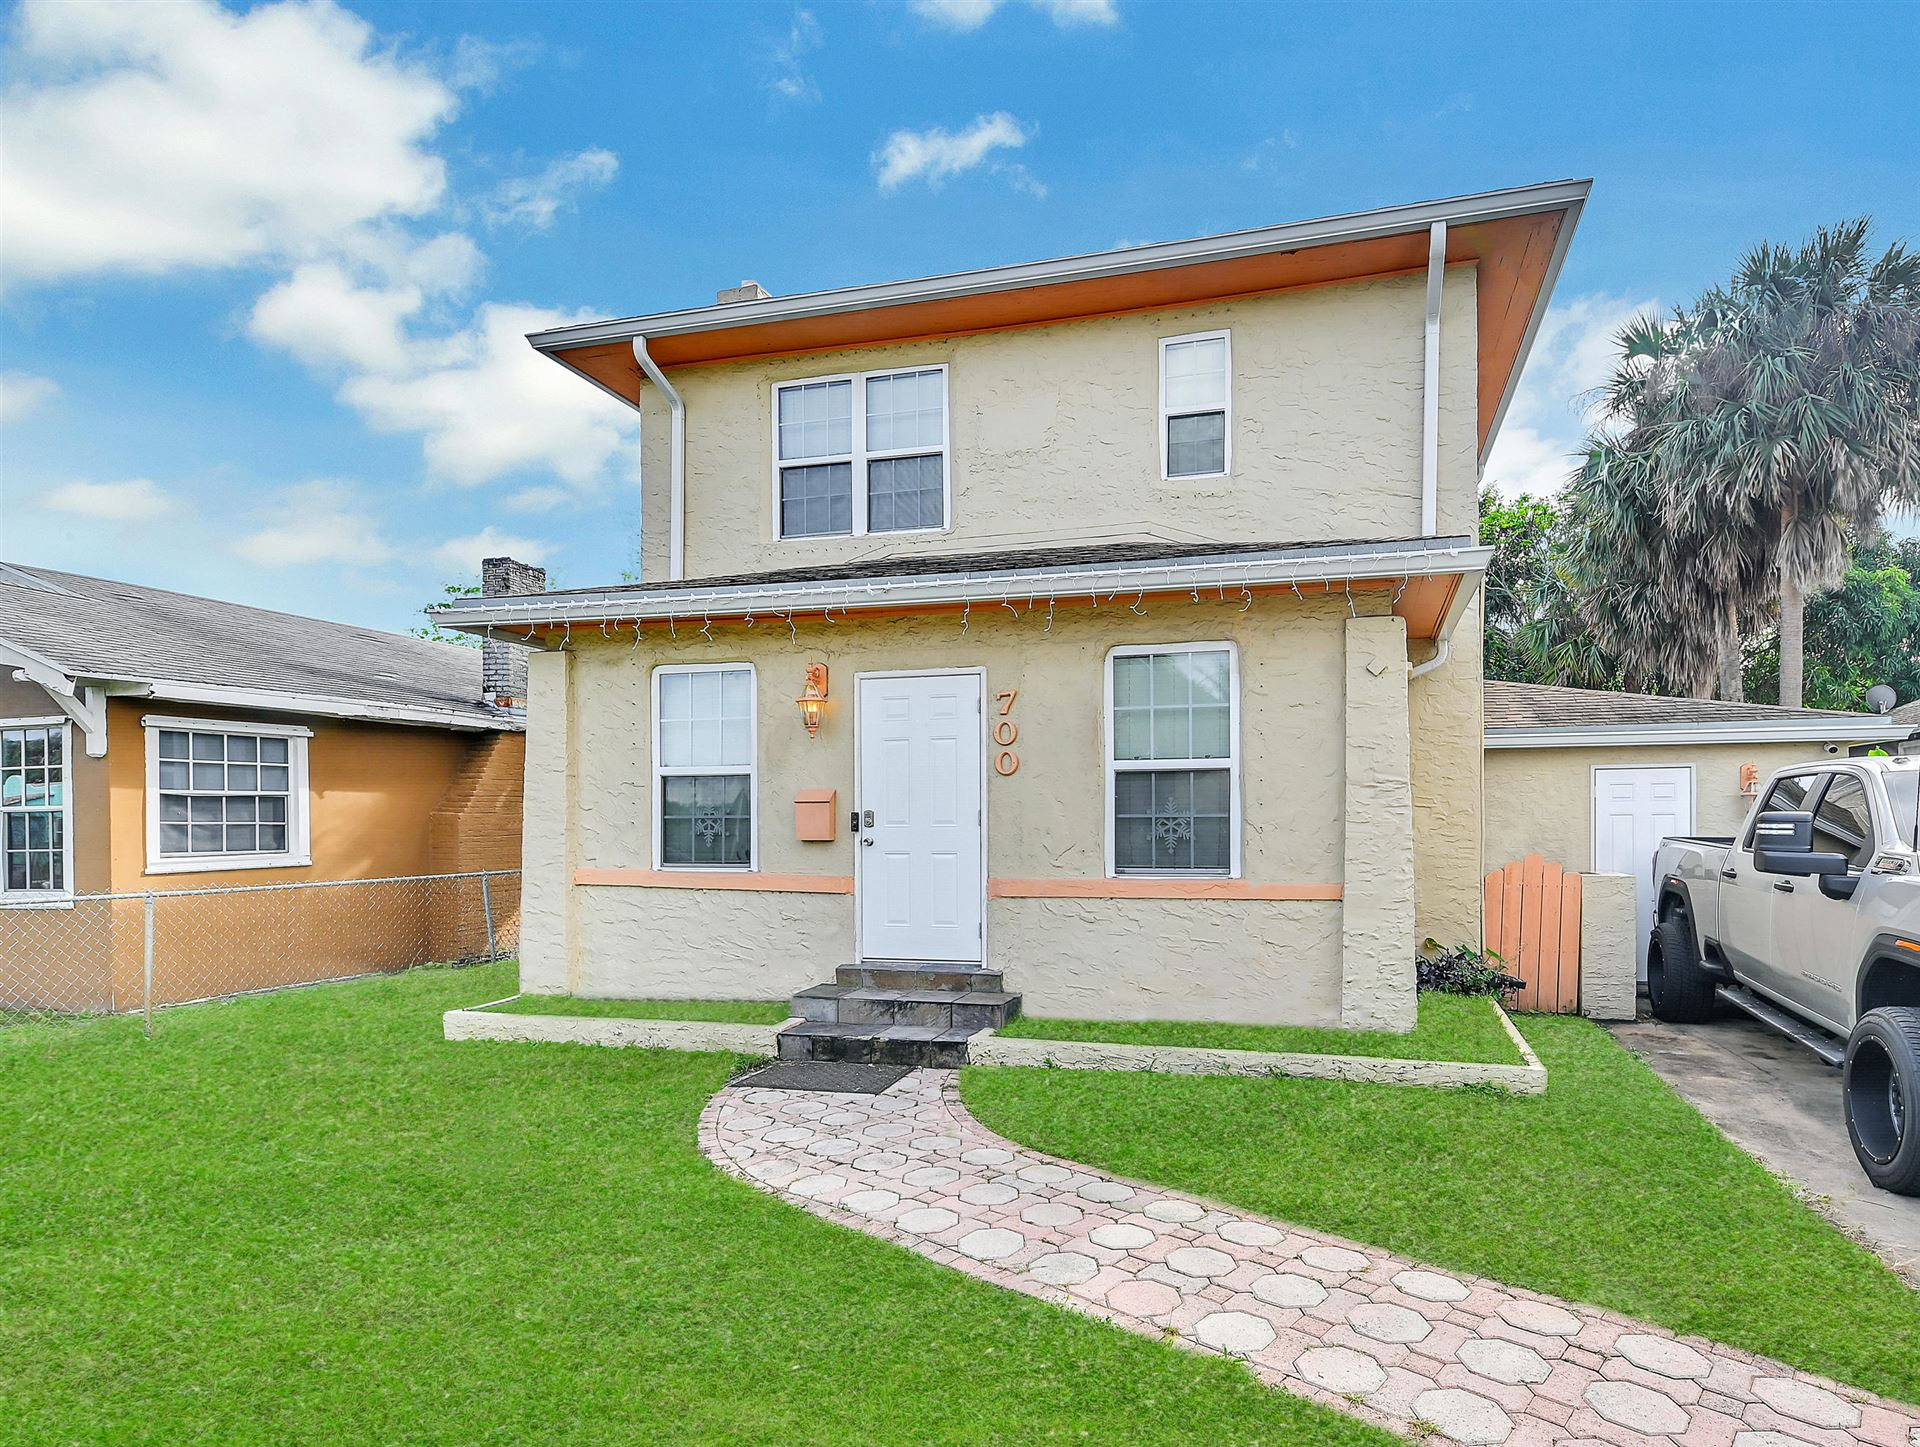 700 38th Street, West Palm Beach, FL 33407 - #: RX-10679204